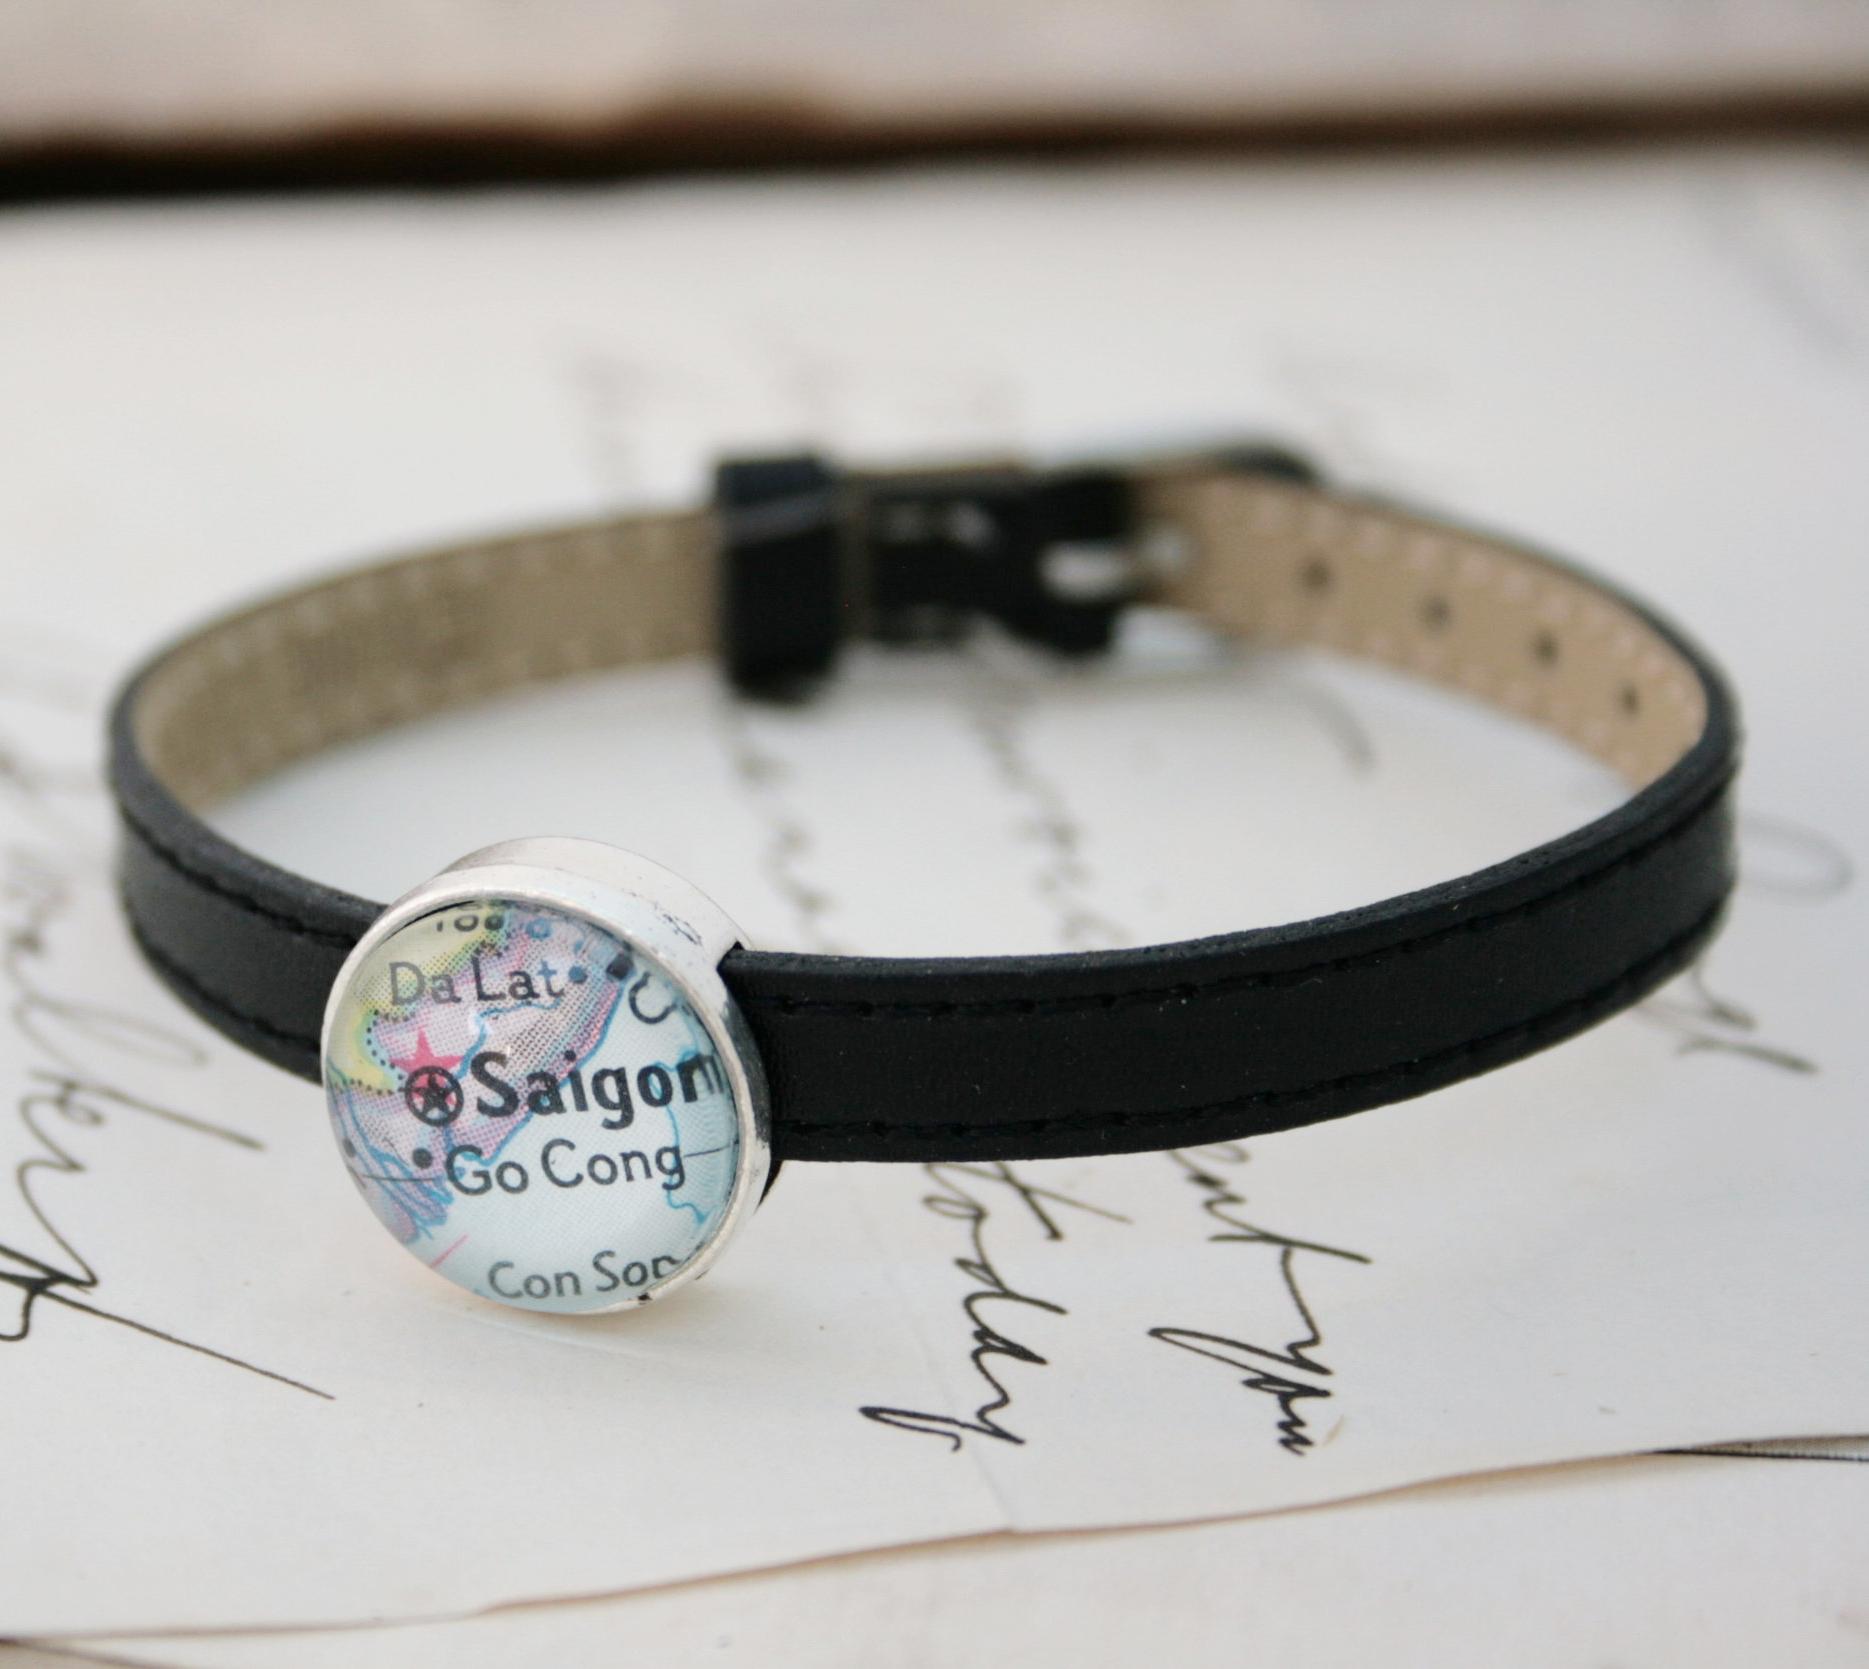 personalized map bracelet / lovely leather womens bracelet with personalized map bead - awesome travel keepsake